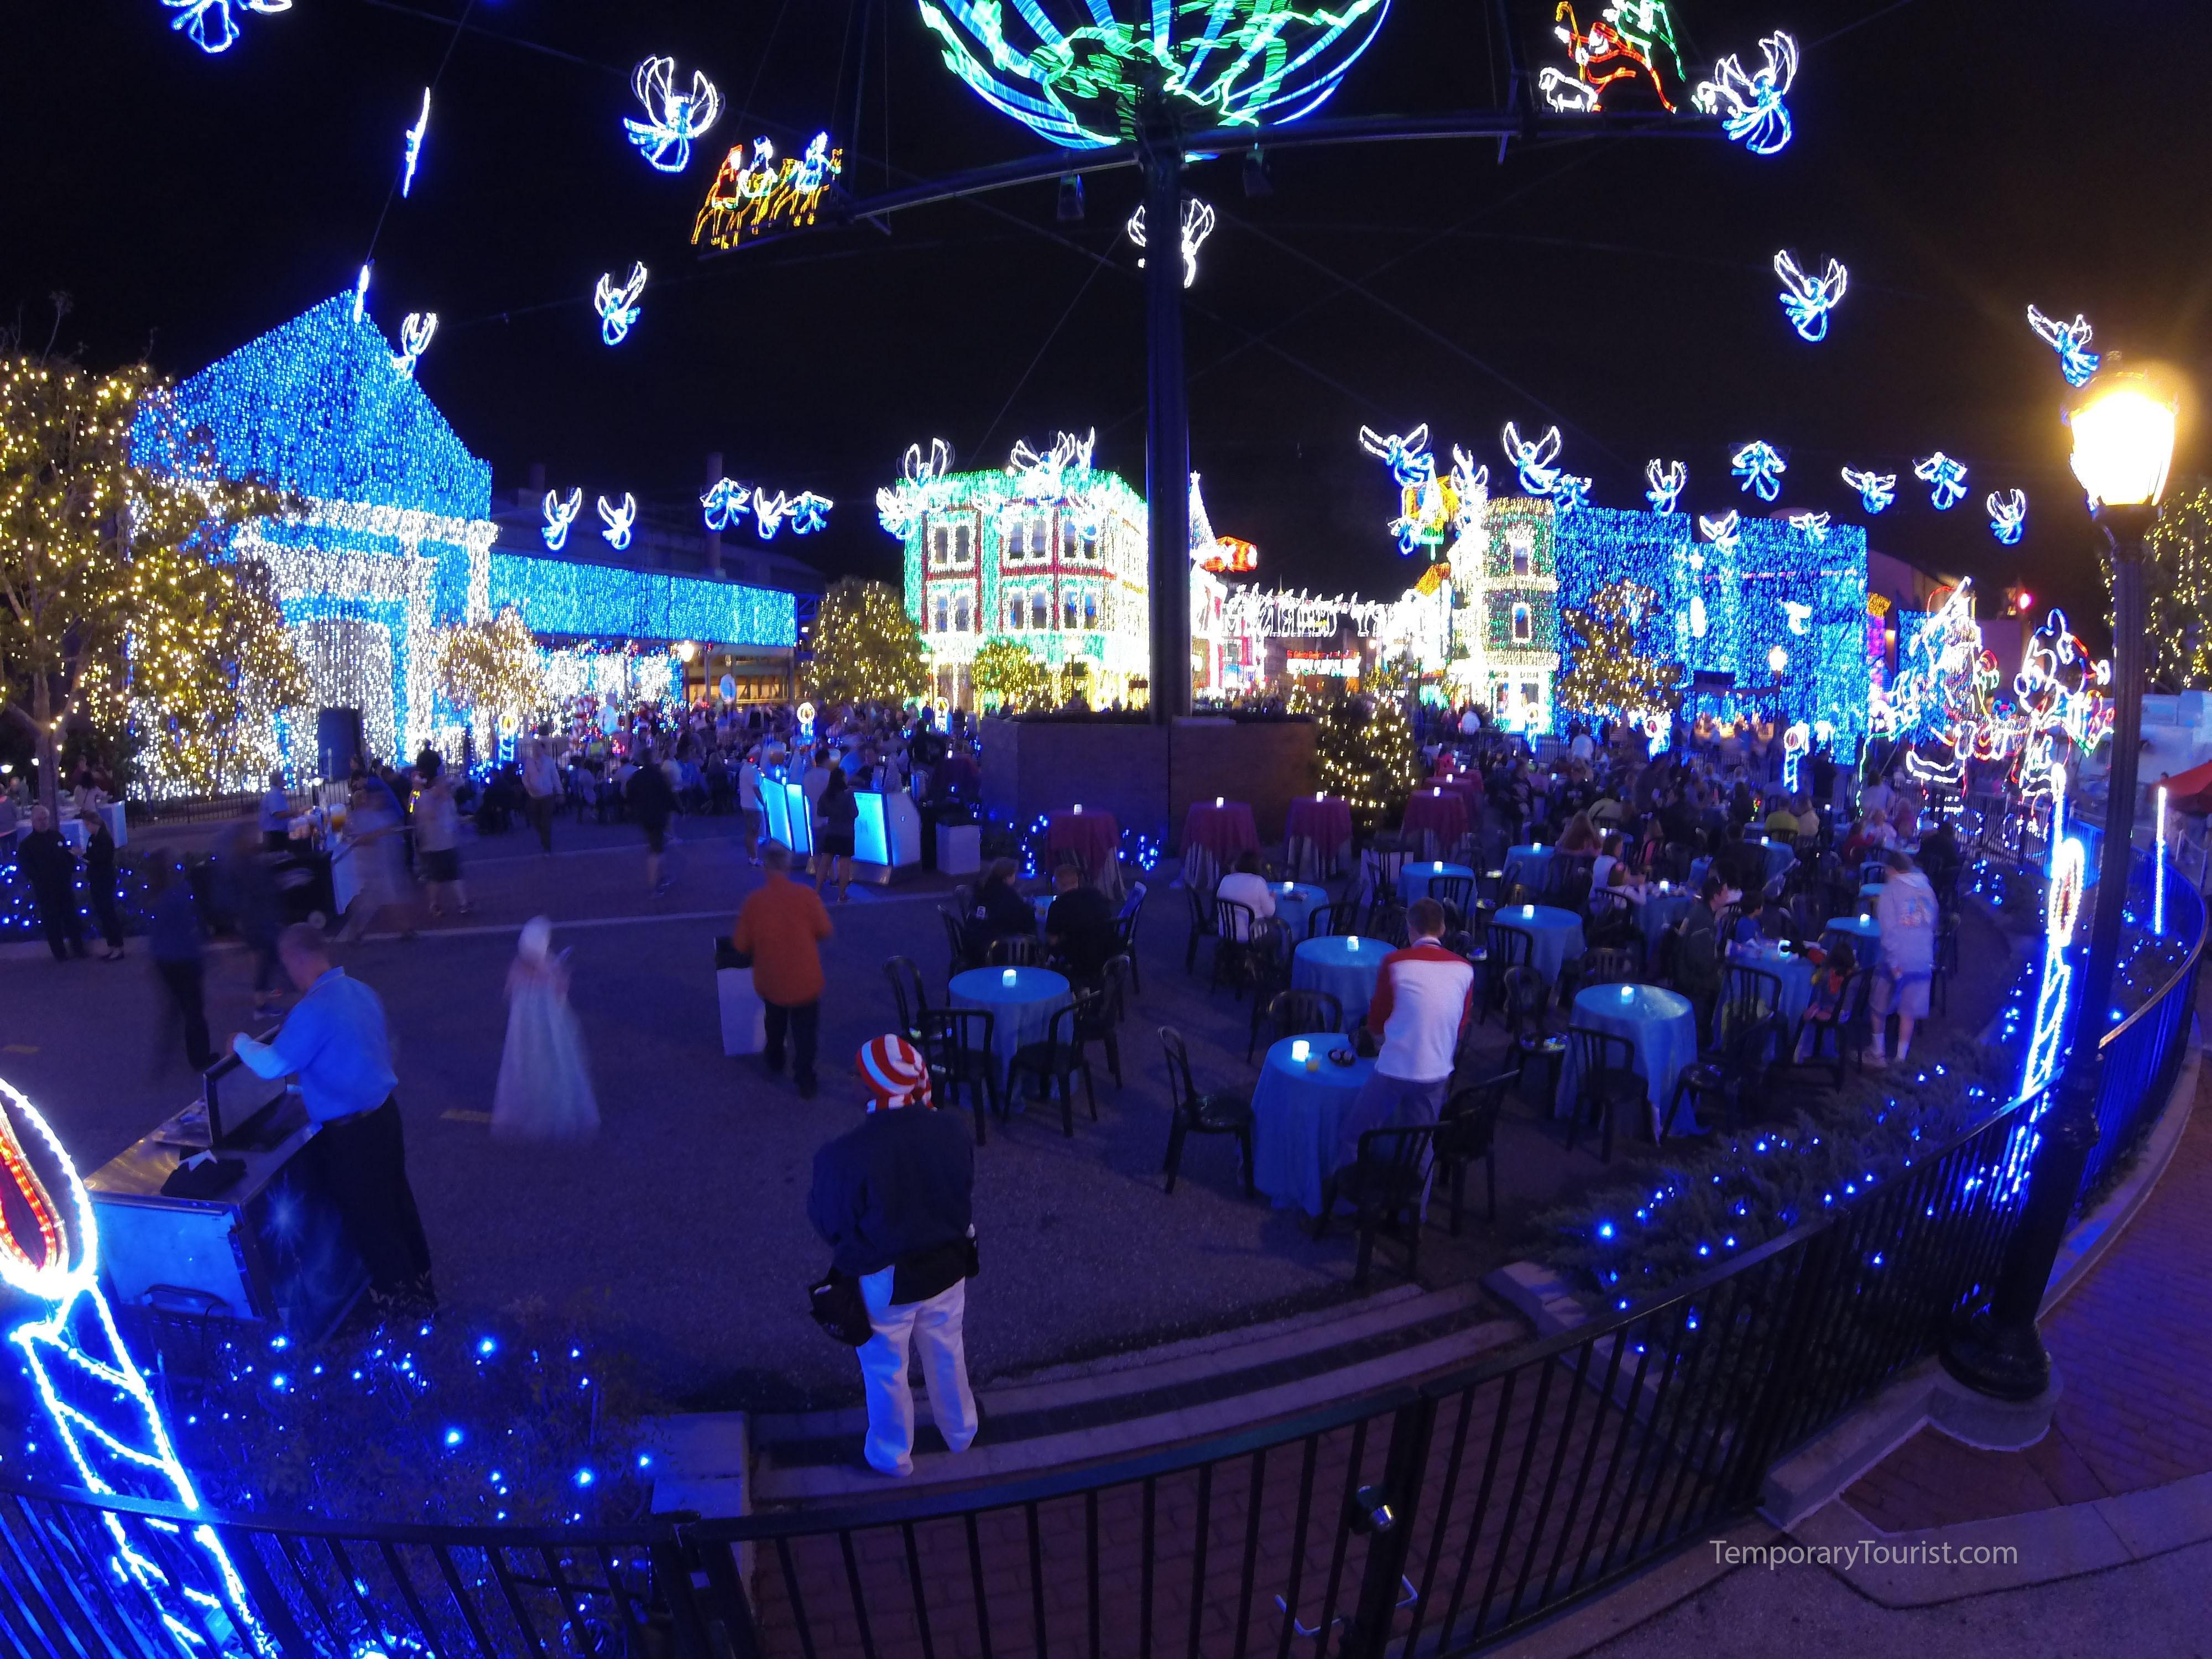 Osborne Lights Dessert Party  Disney's Frozen Holiday Premium Package – Hit or Miss